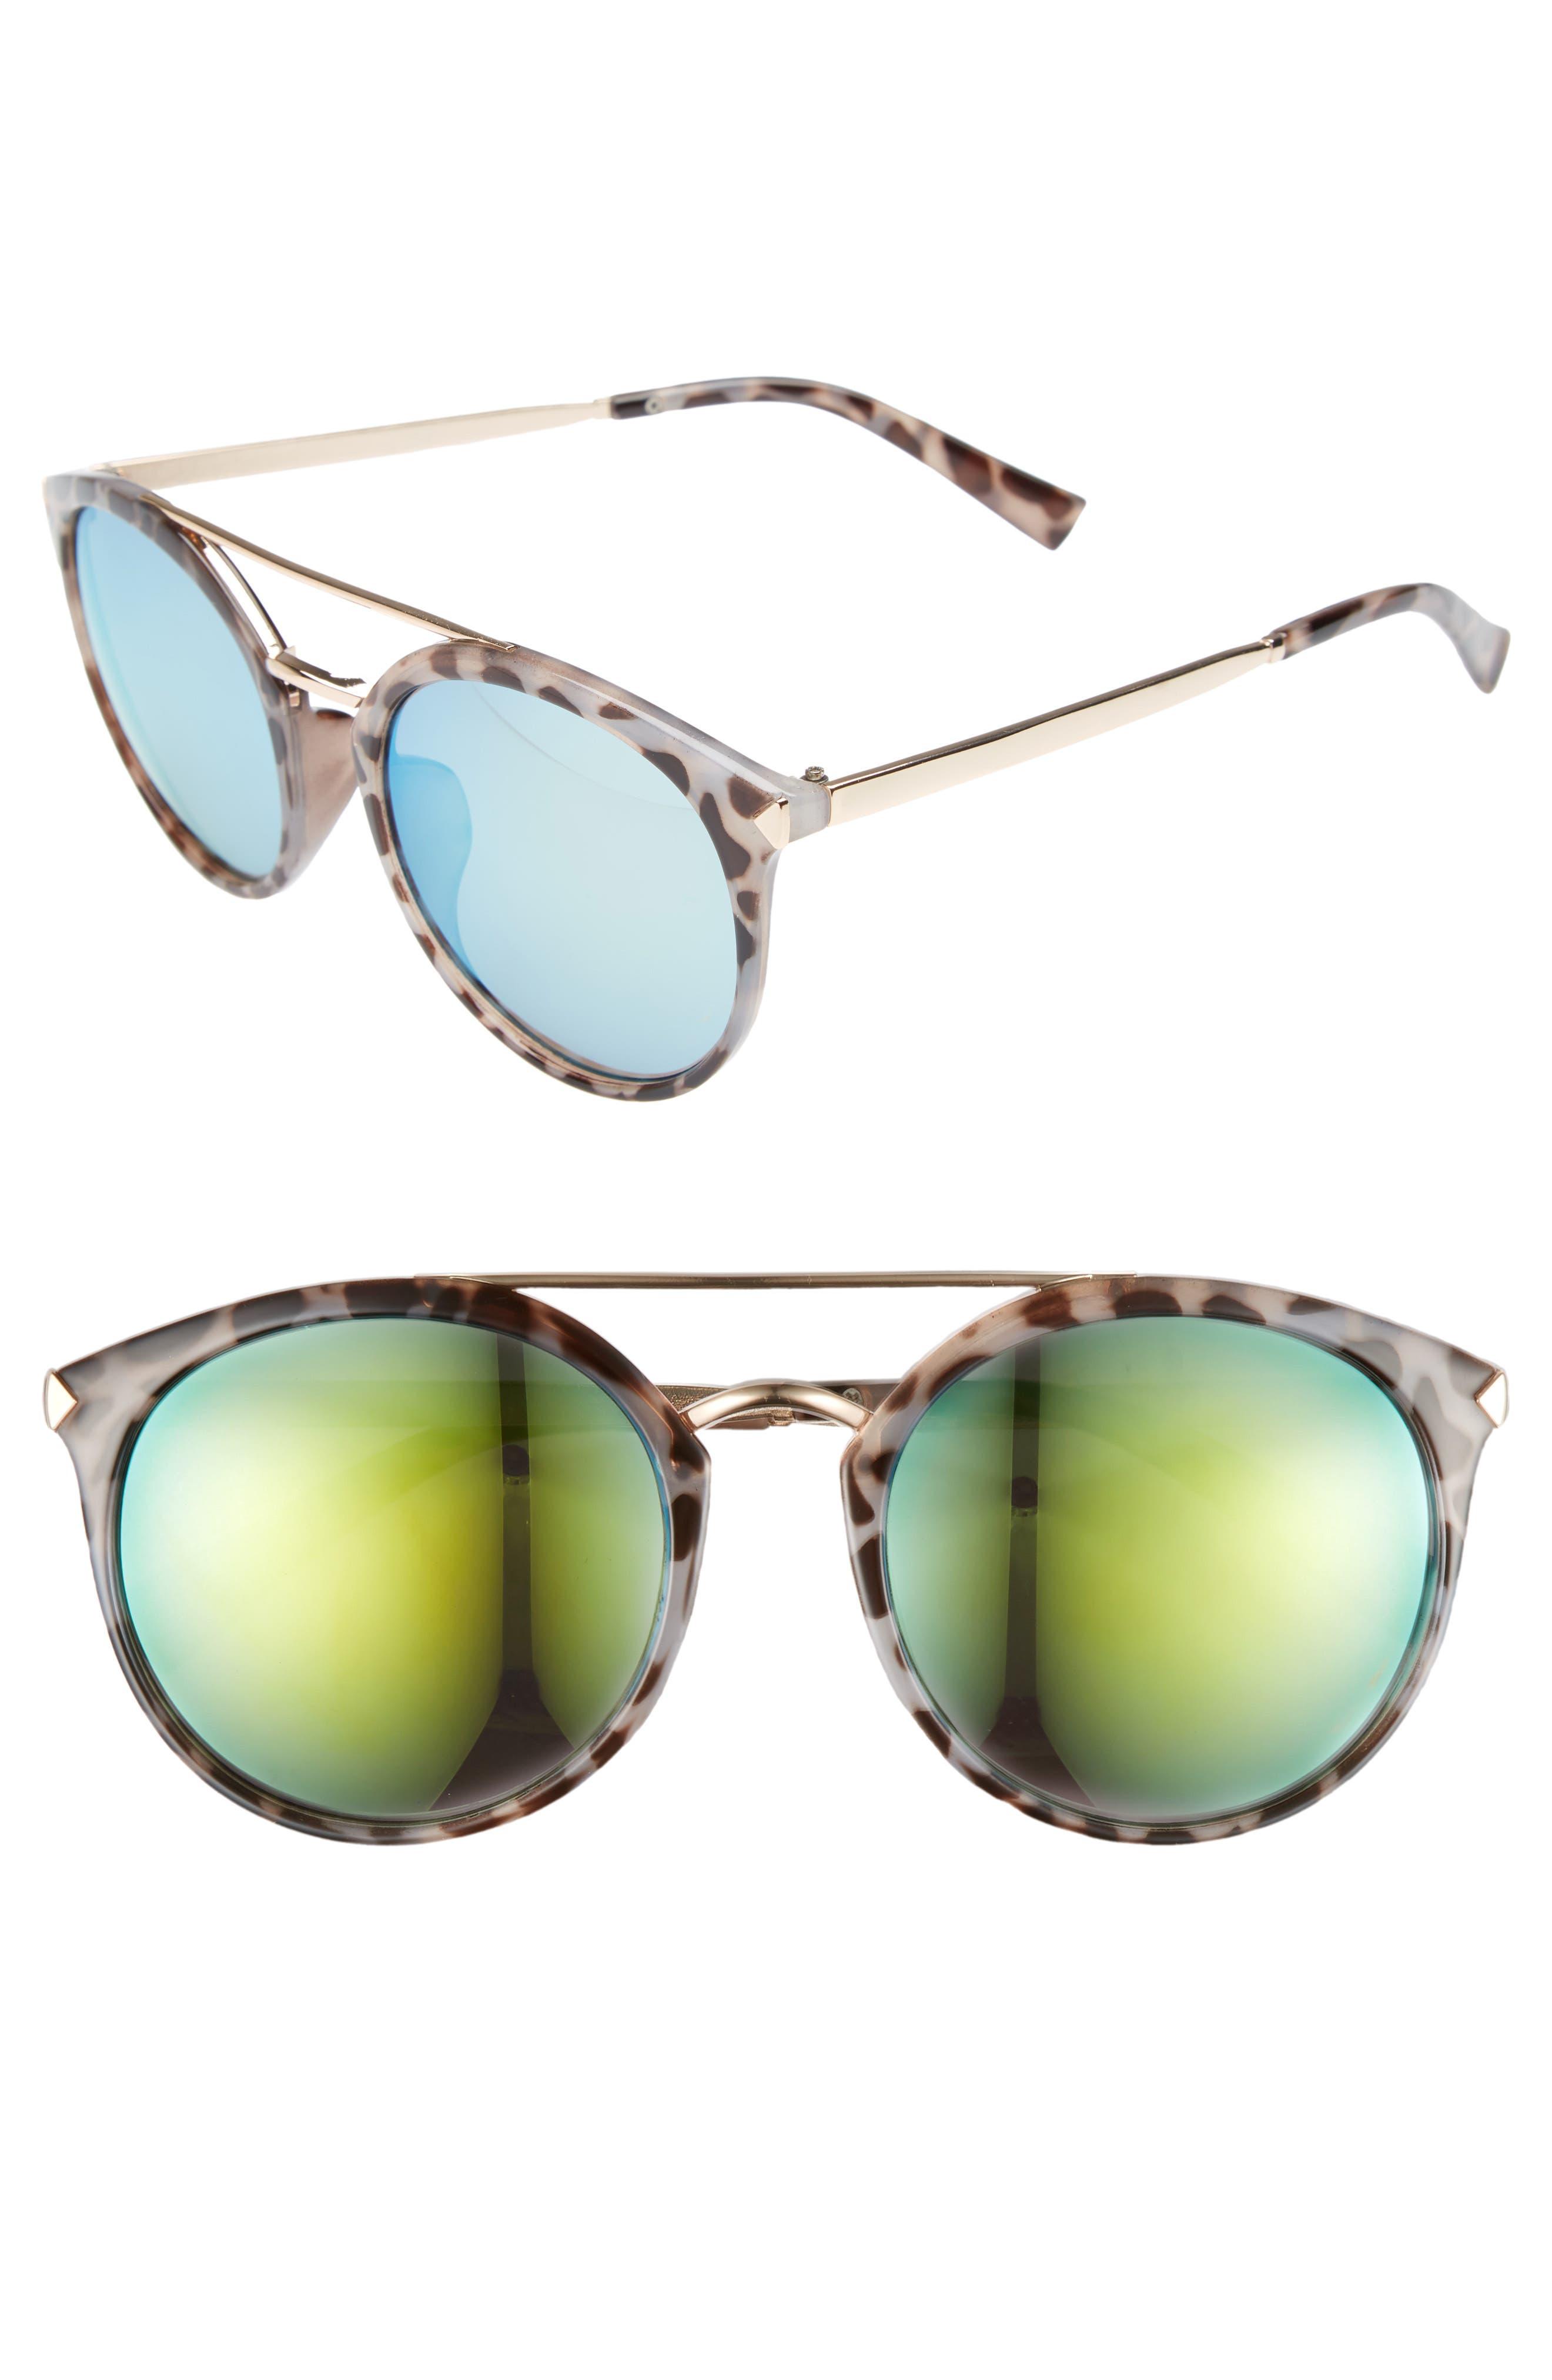 Alternate Image 1 Selected - BP. 55mm Mirrored Sunglasses